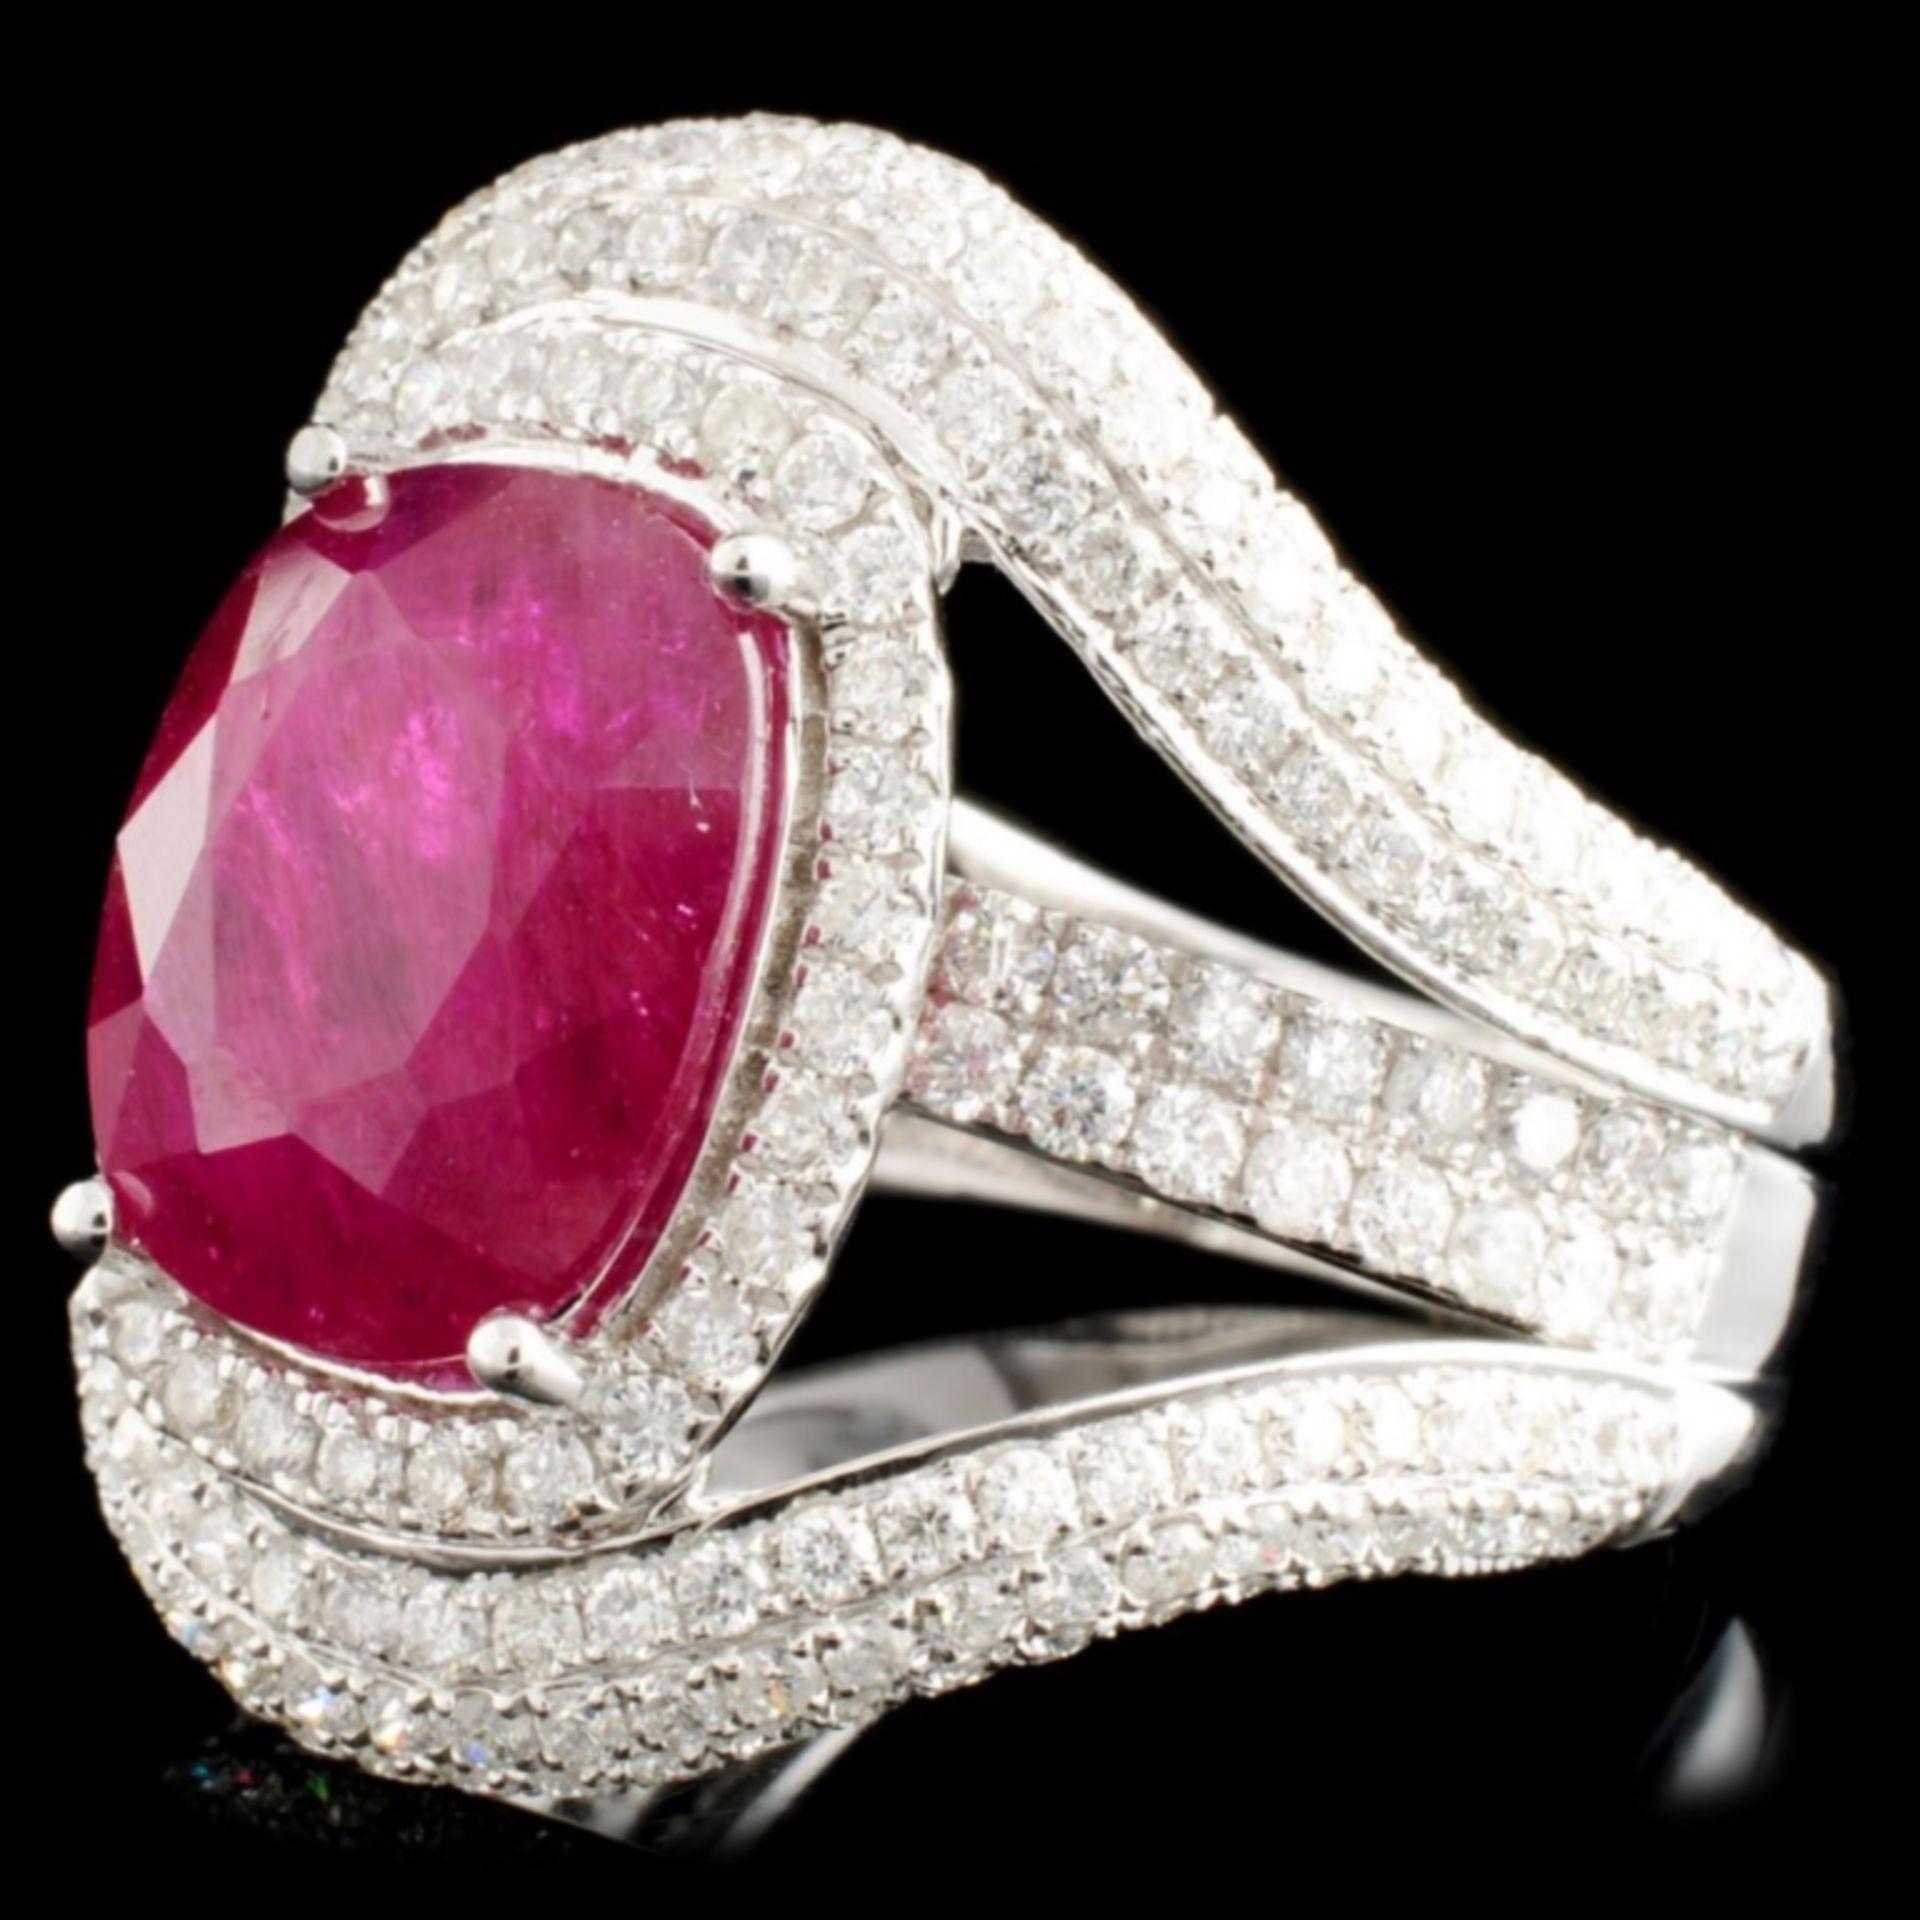 18K Gold 5.17ct Ruby & 1.95ctw Diamond Ring - Image 2 of 5